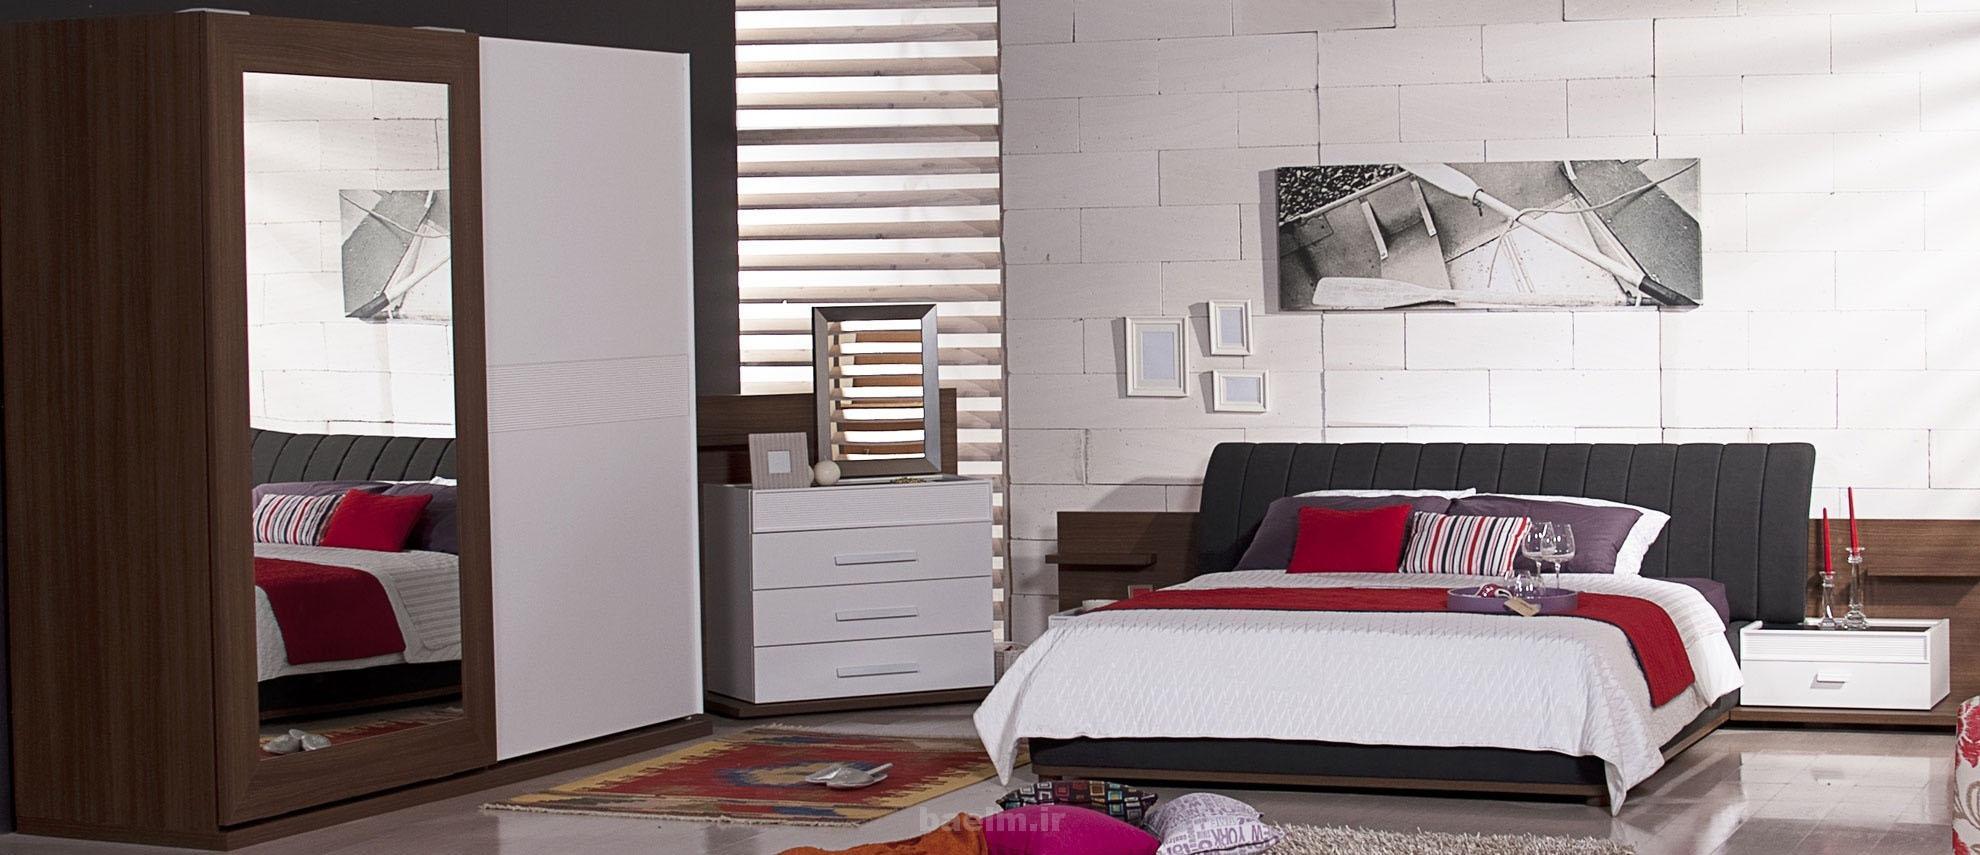 bedroom furniture designs 1 Bedroom Furniture Designs